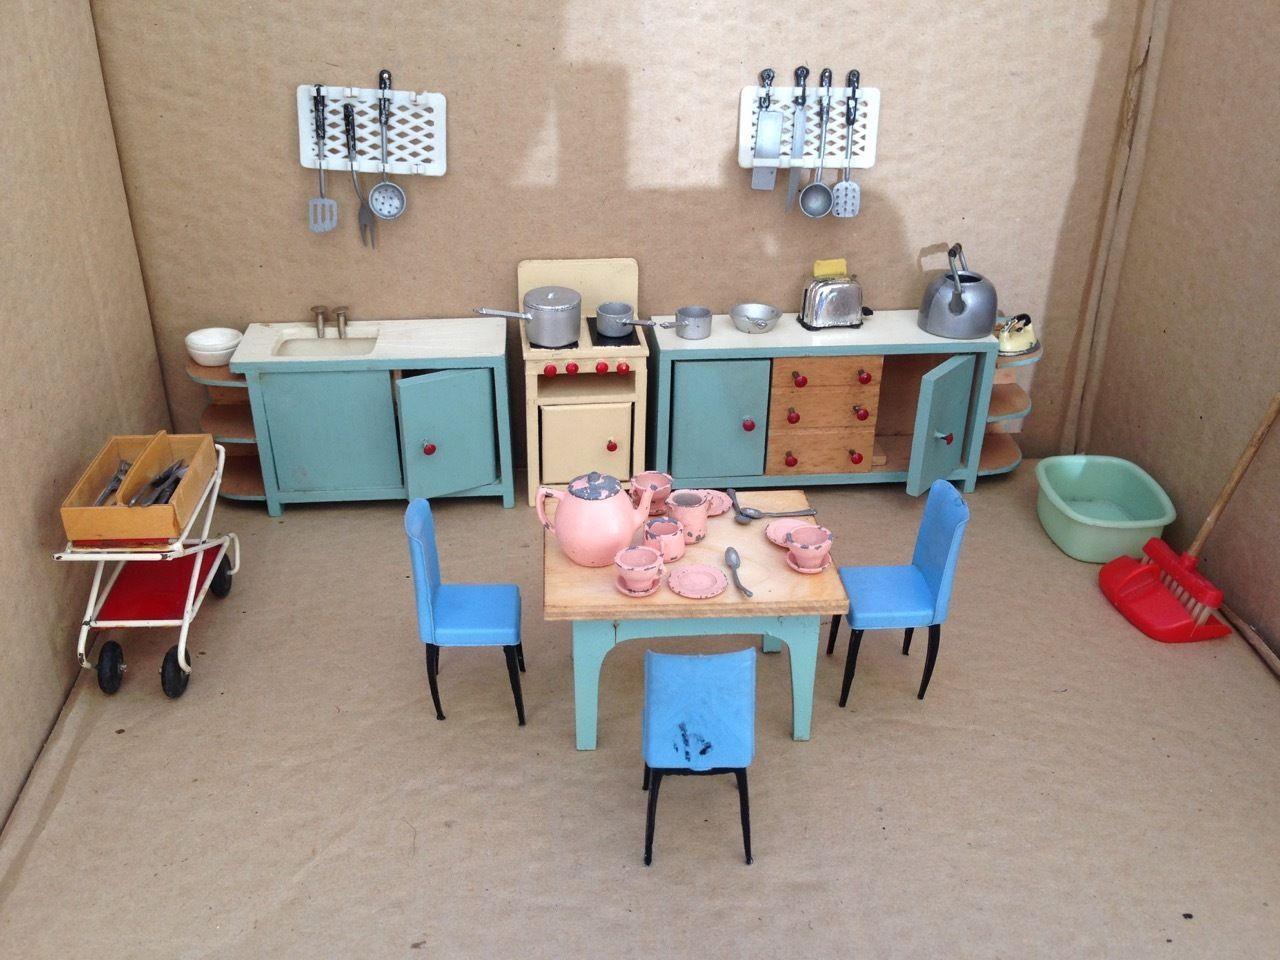 VINTAGE DOLLS HOUSE FURNITURE   1960s   KITCHEN UNITS, LEAD PANS, CUTLERY  ETC | EBay